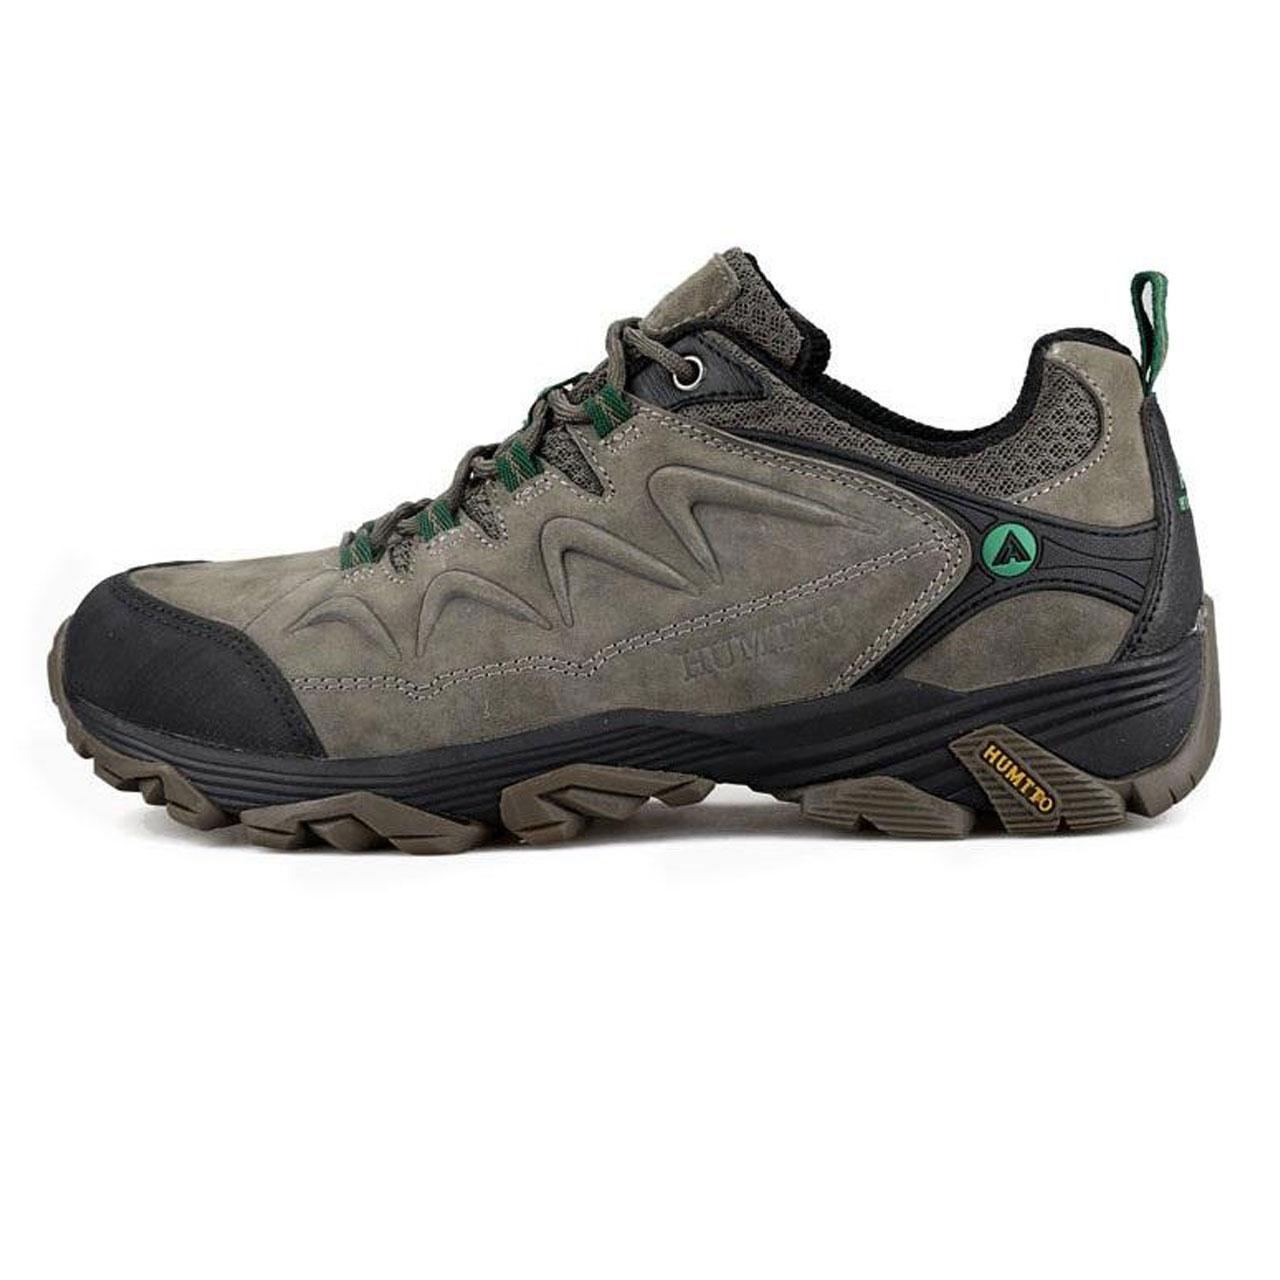 قیمت کفش کوهنوردی مردانه هامتو مدل 2-1520